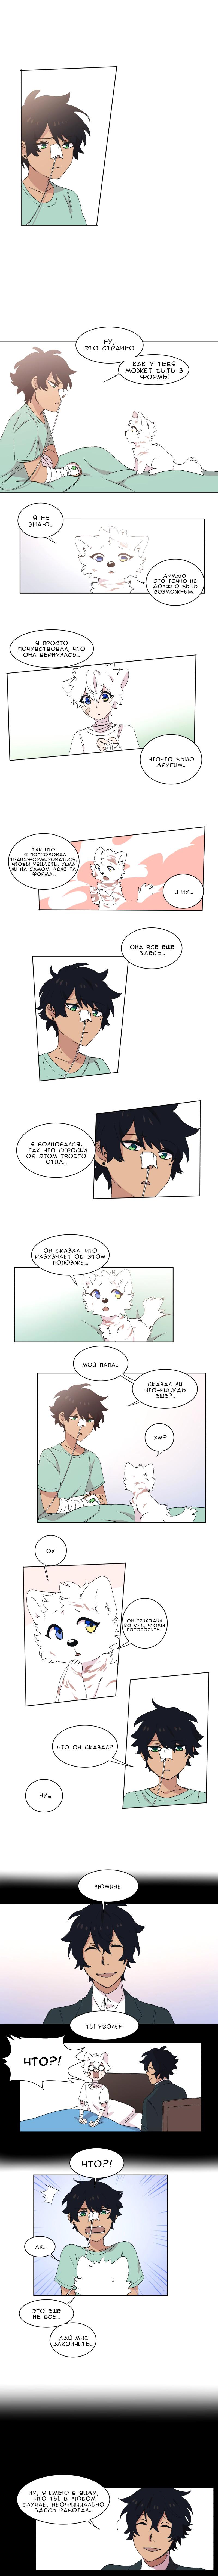 https://r1.ninemanga.com/comics/pic2/38/32806/411995/1524571754843.jpg Page 1